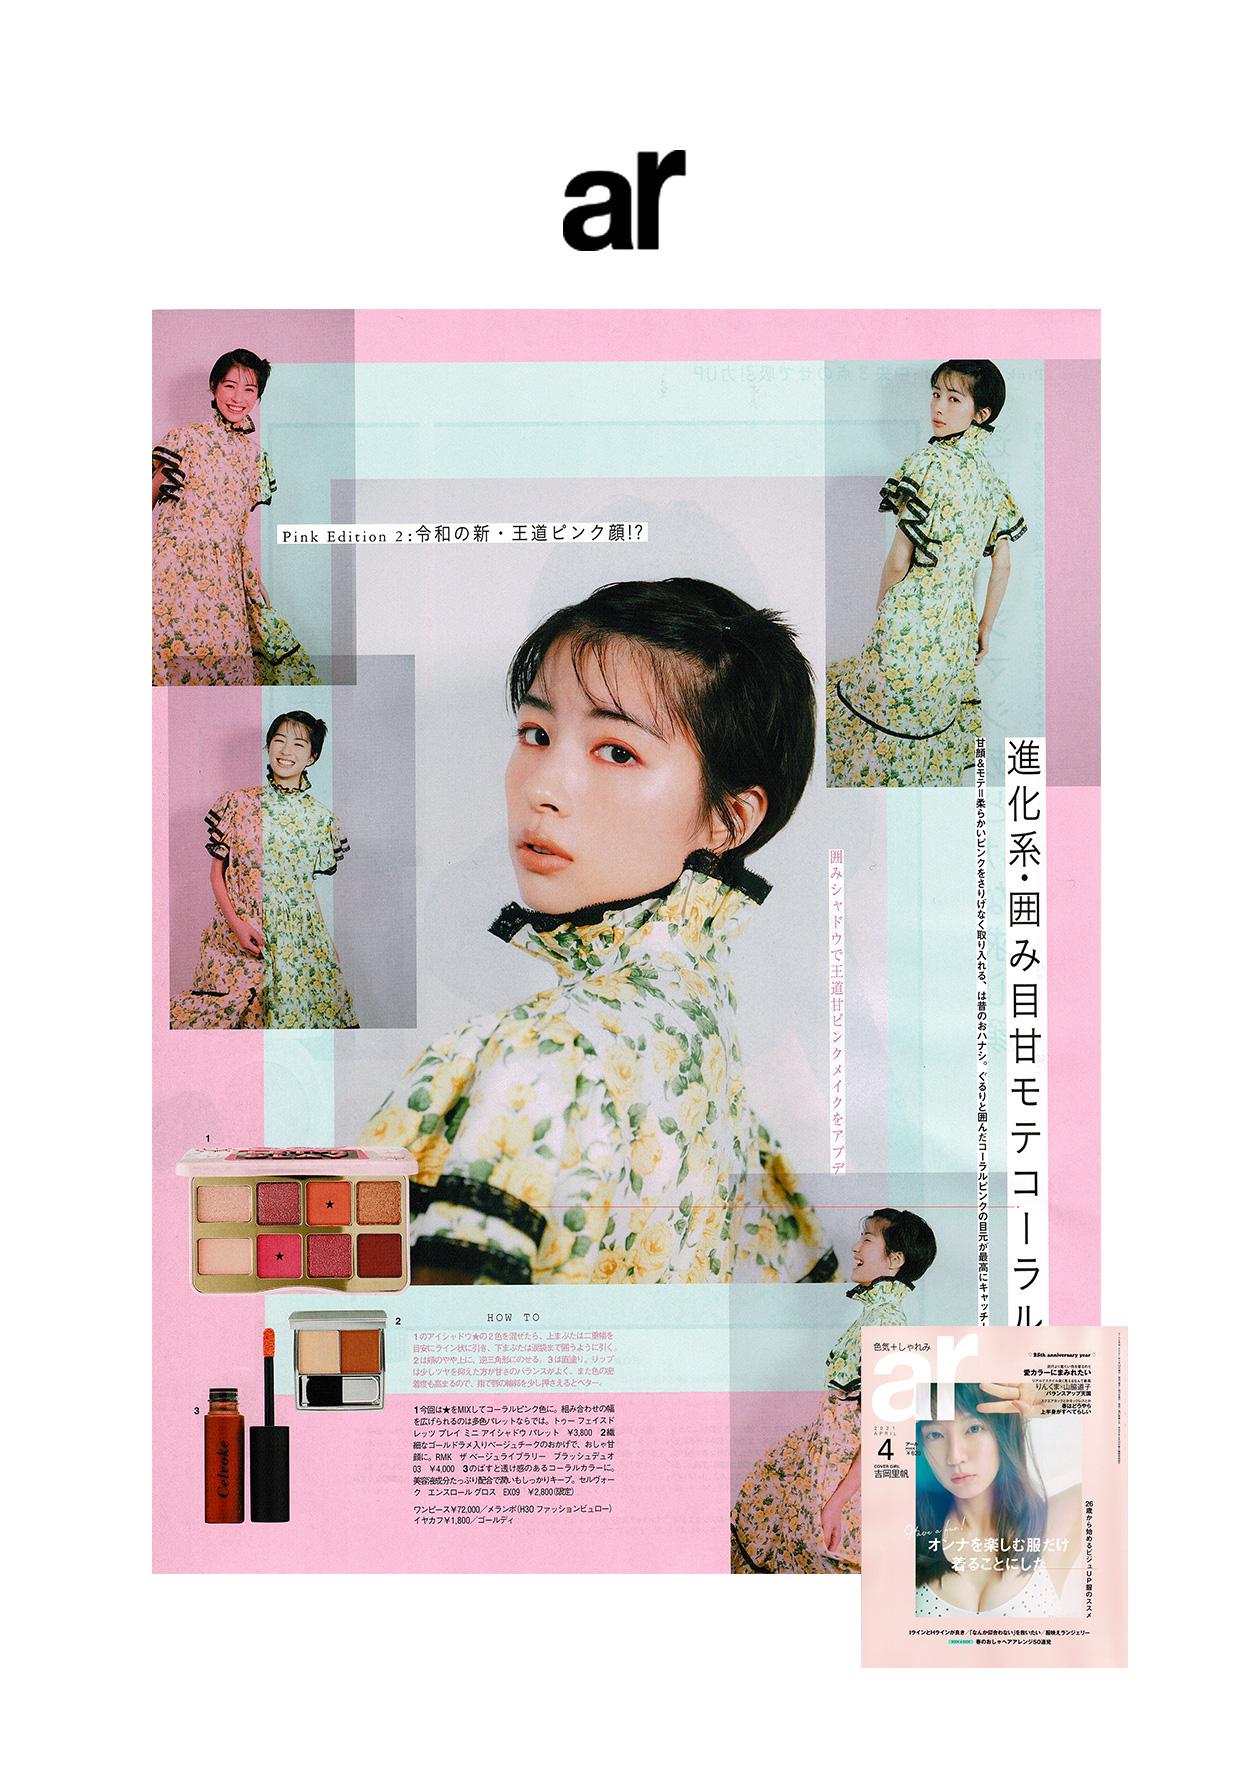 melampo press on sweet magazine3